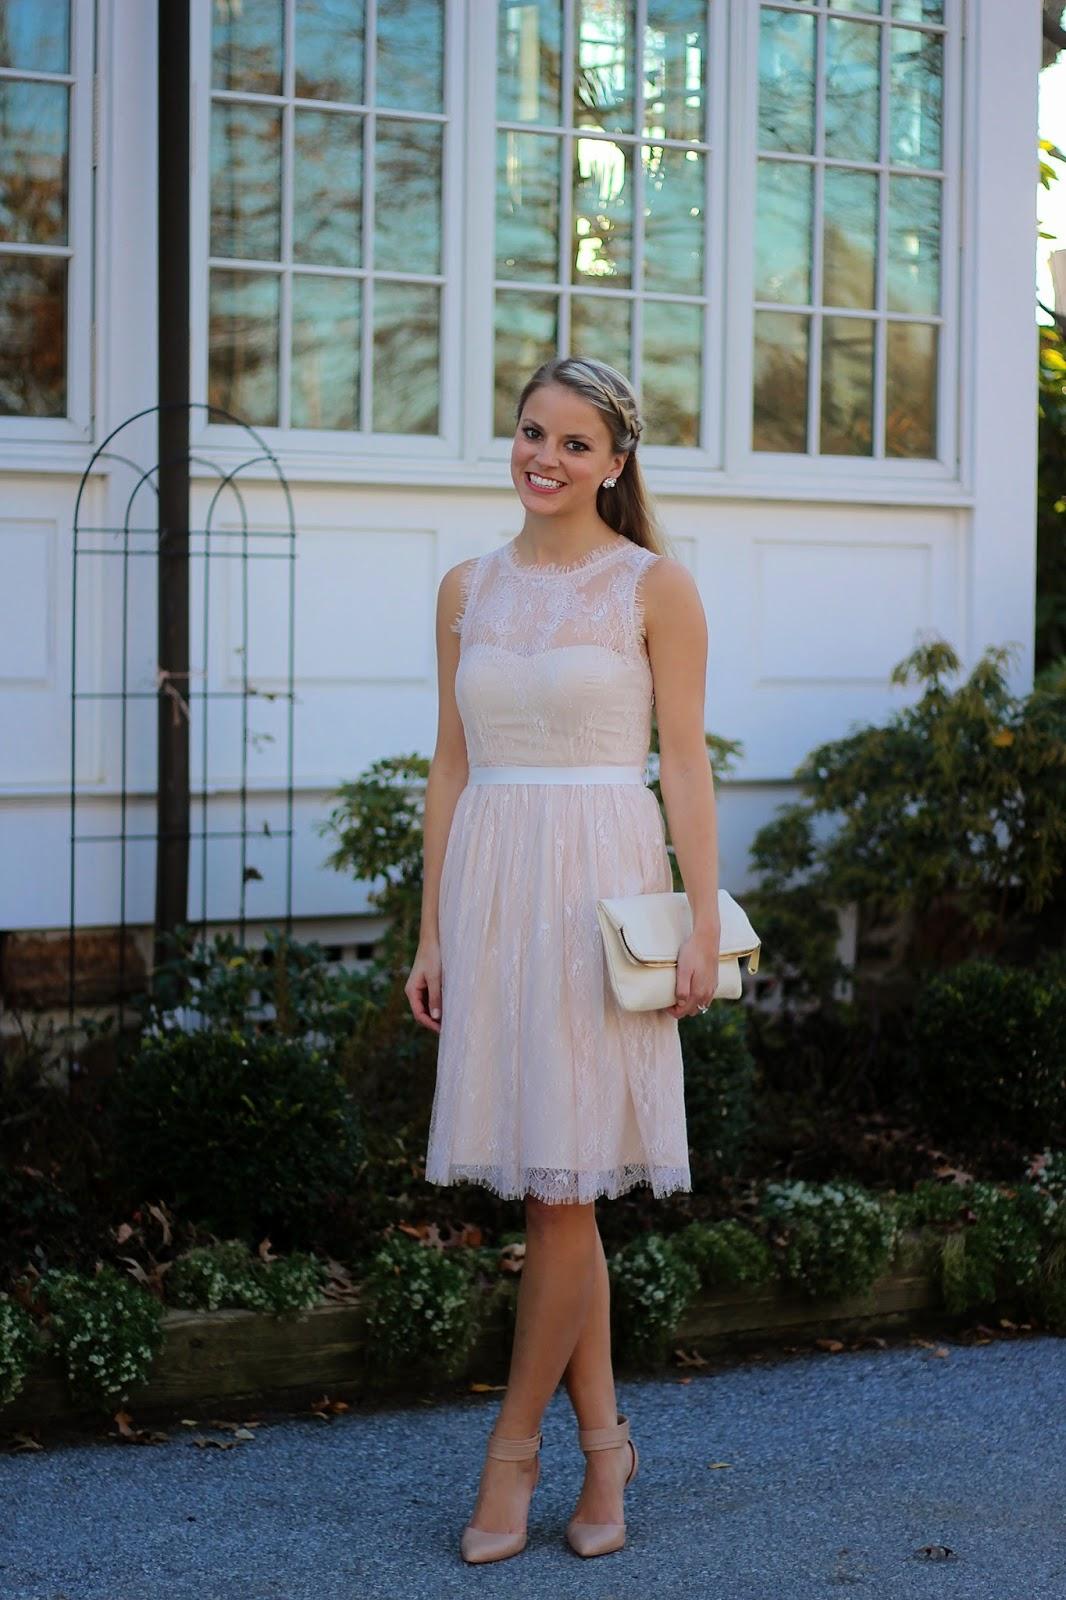 engagement party dress, bridal dress, wedding, bhldn, lace dress, bridal shower dress, bride